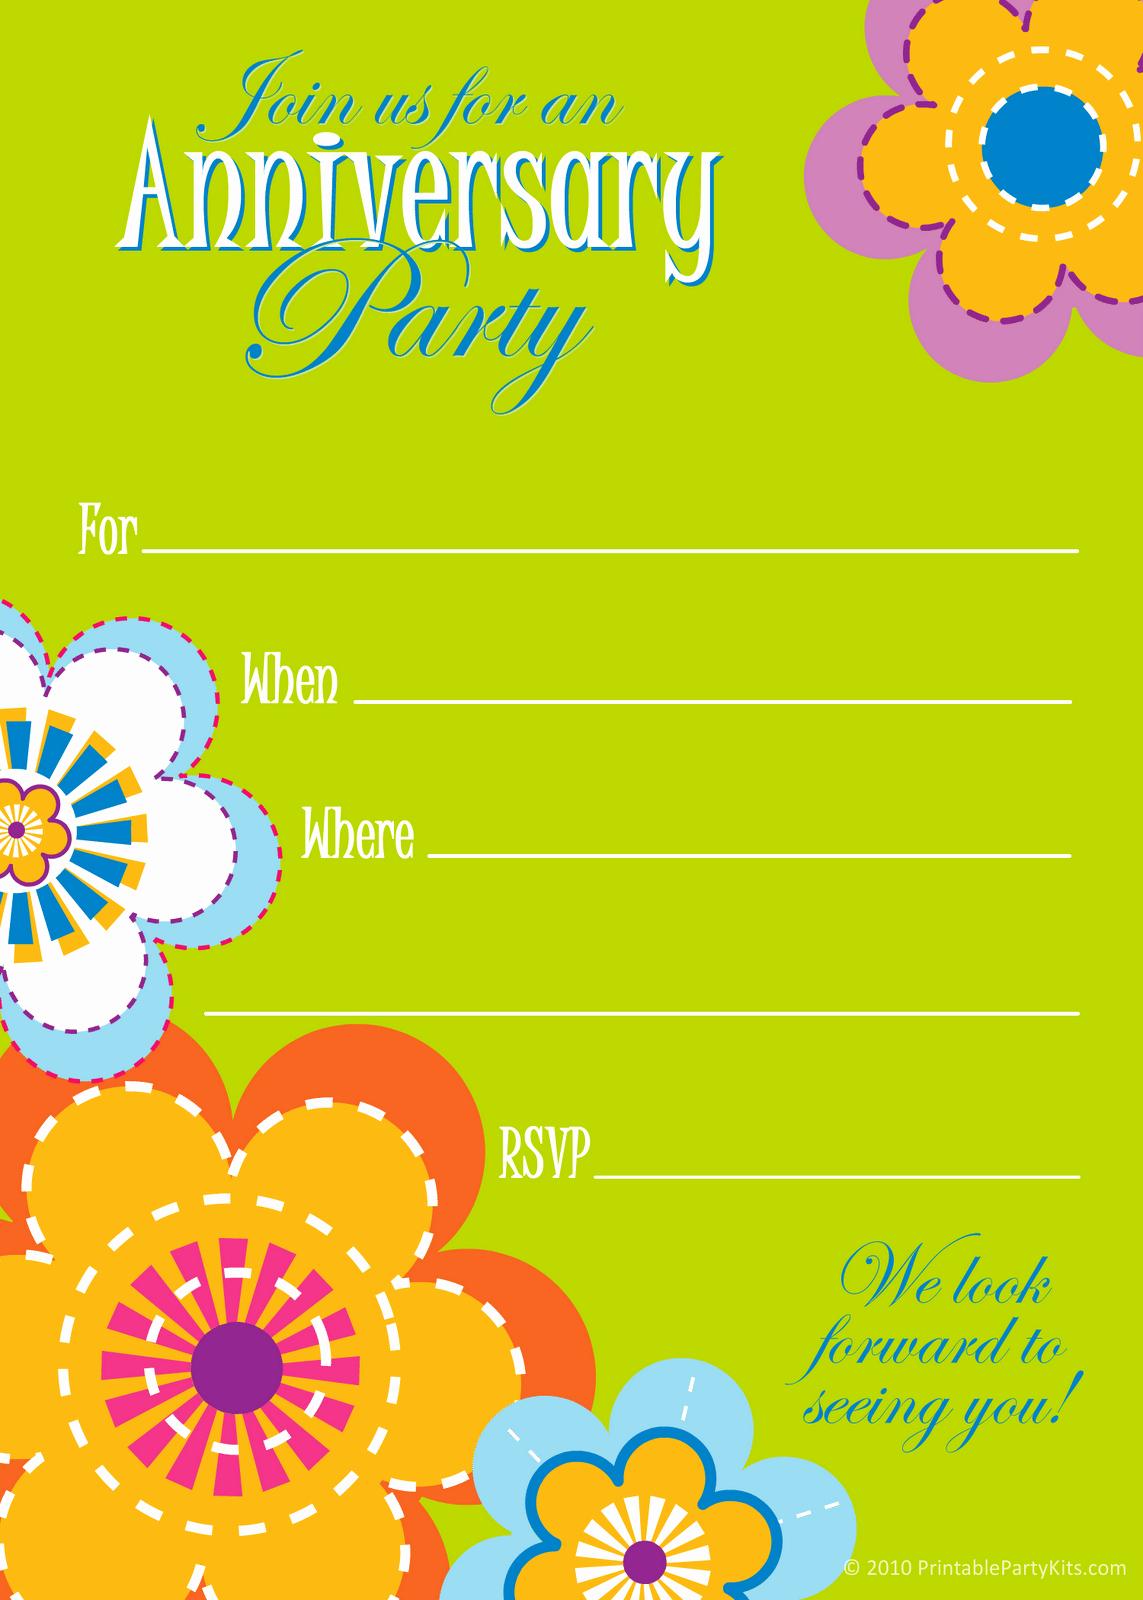 Wedding Anniversary Invitation Template Fresh Wedding Anniversary Invitation Template Free